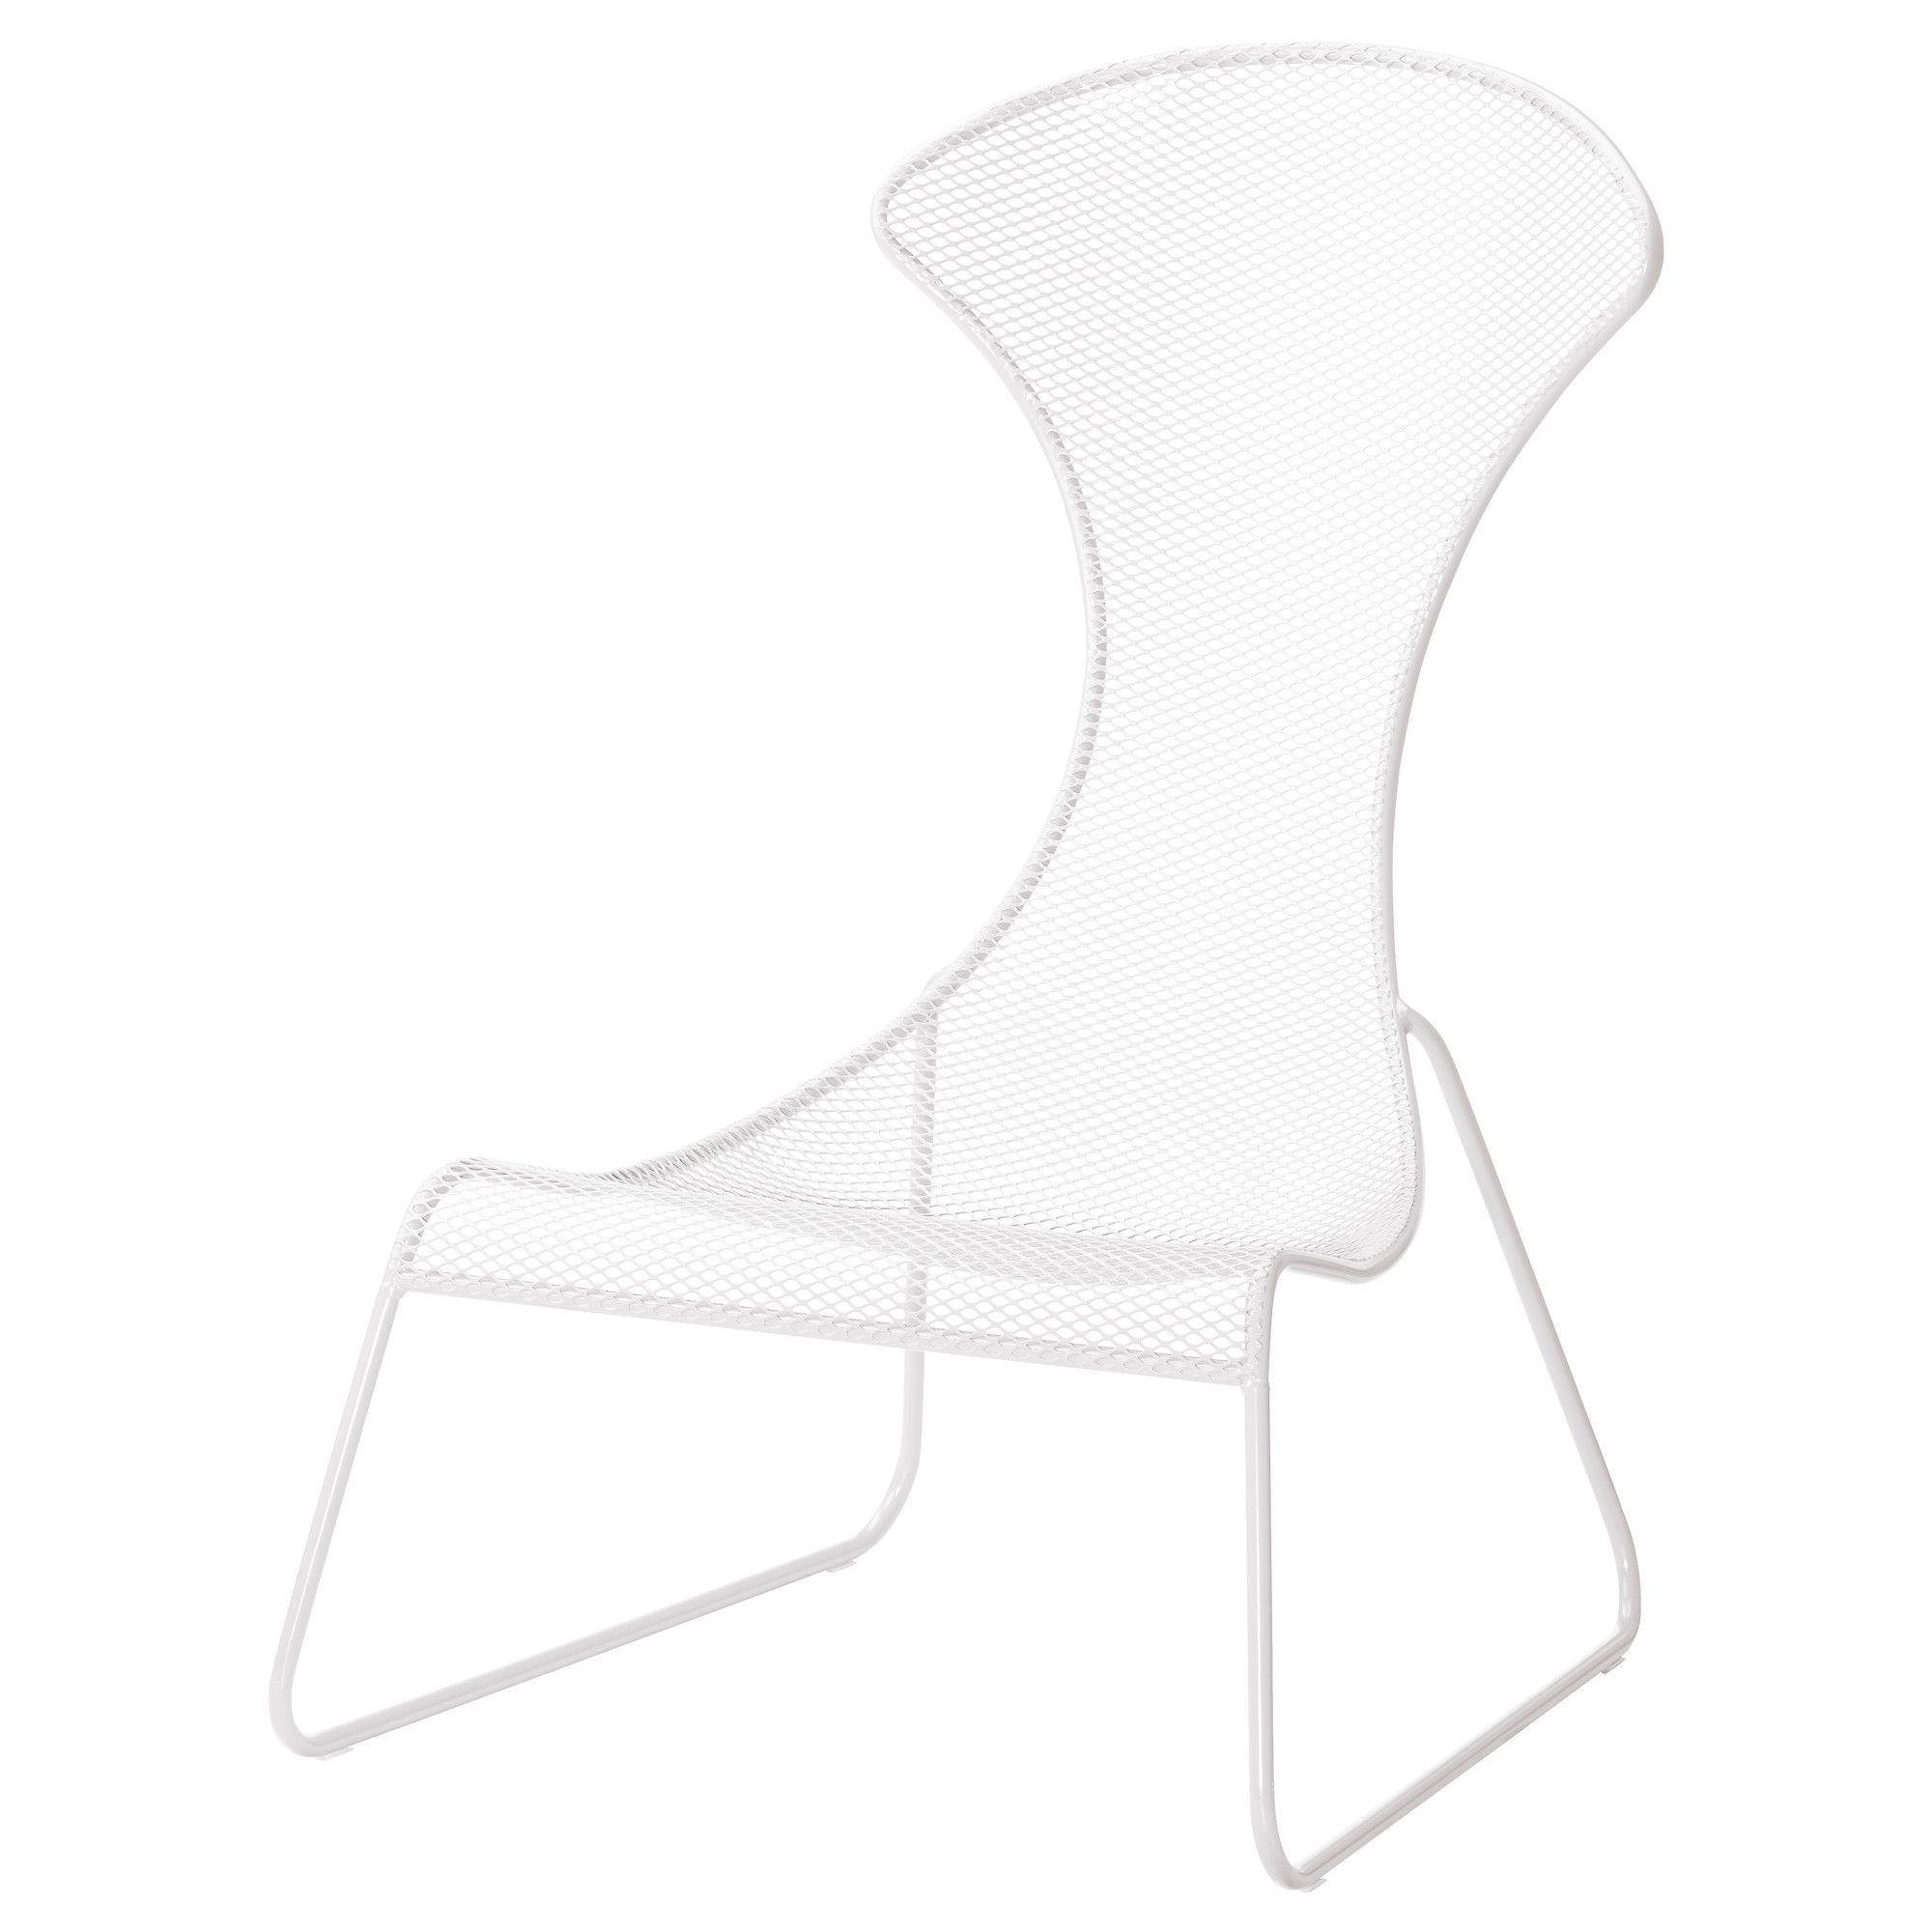 IKEA PS 2012 Easy chair - white - IKEA | Patio Furniture ...